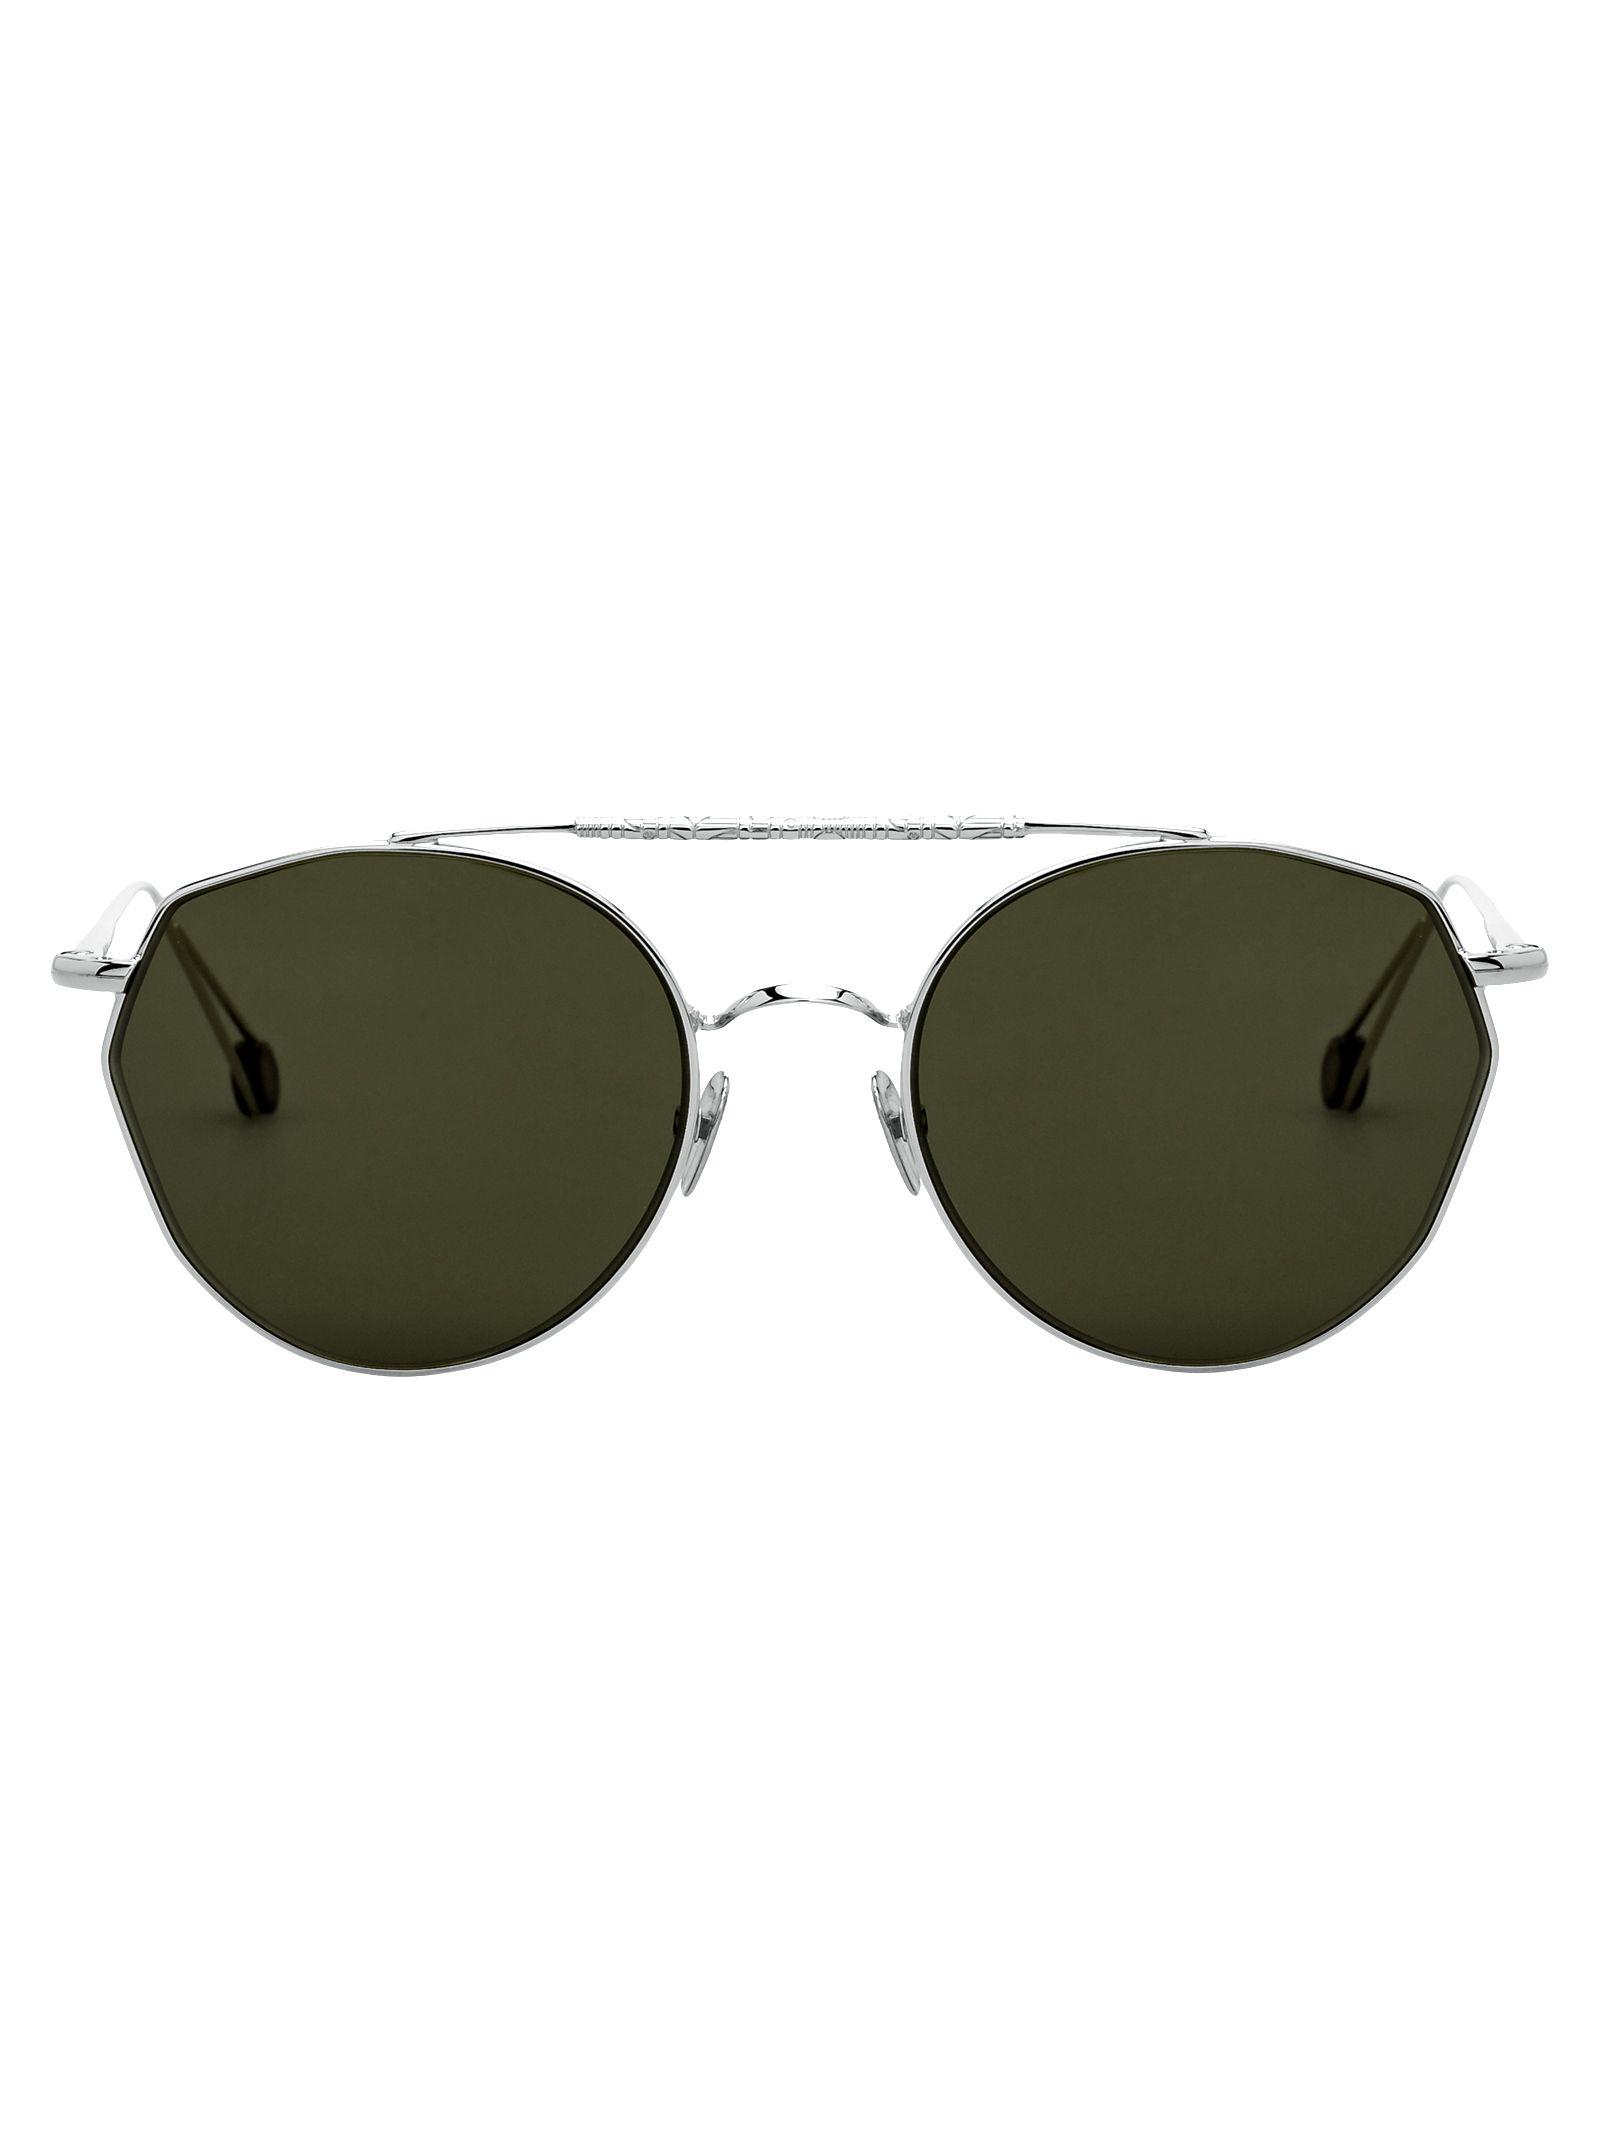 Place Carre sunglasses - Metallic Ahlem ciwS8HKDHP